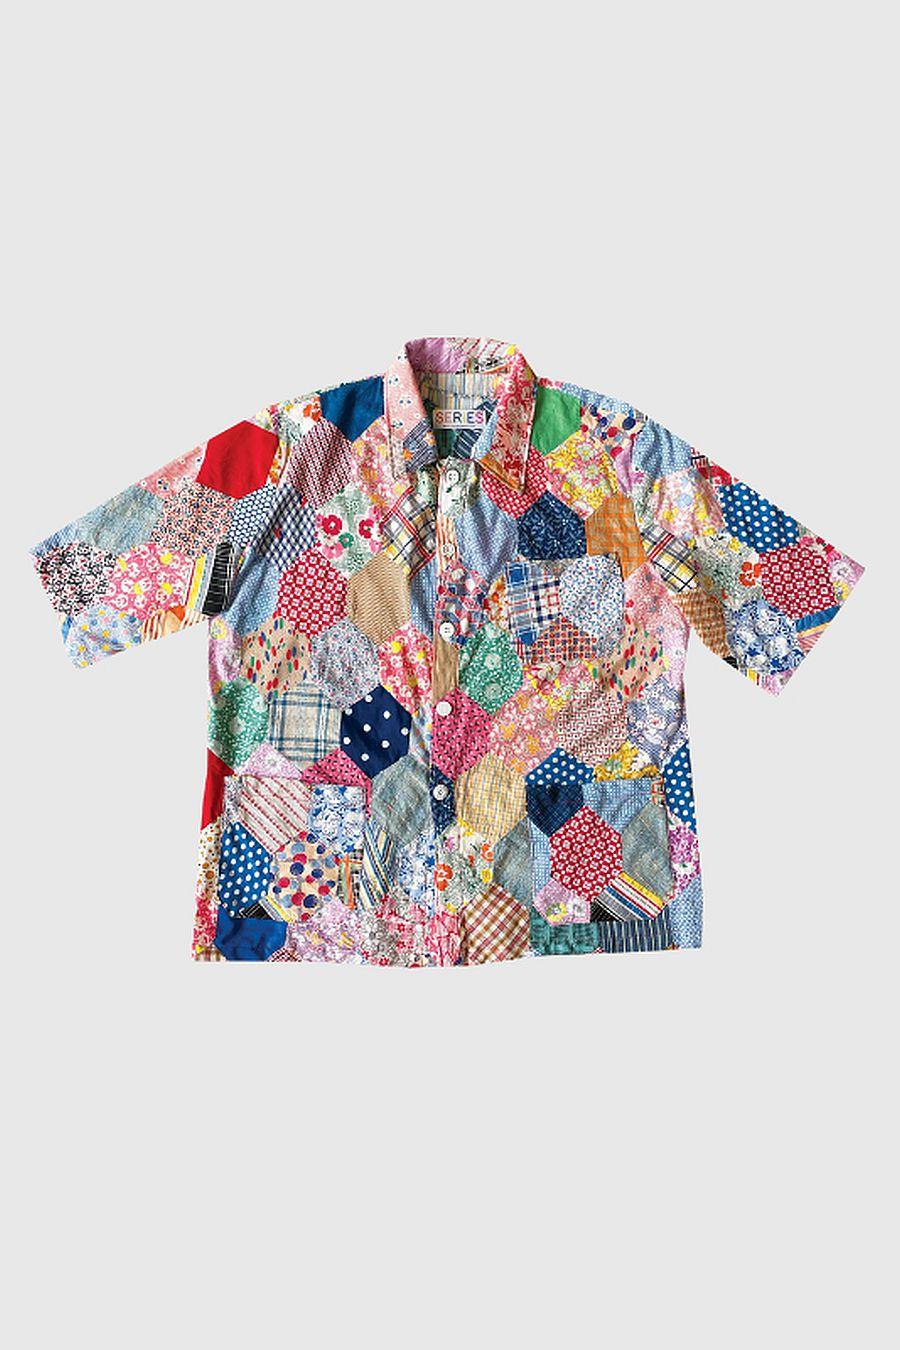 The Series NY Chore Shirt - QSCH007